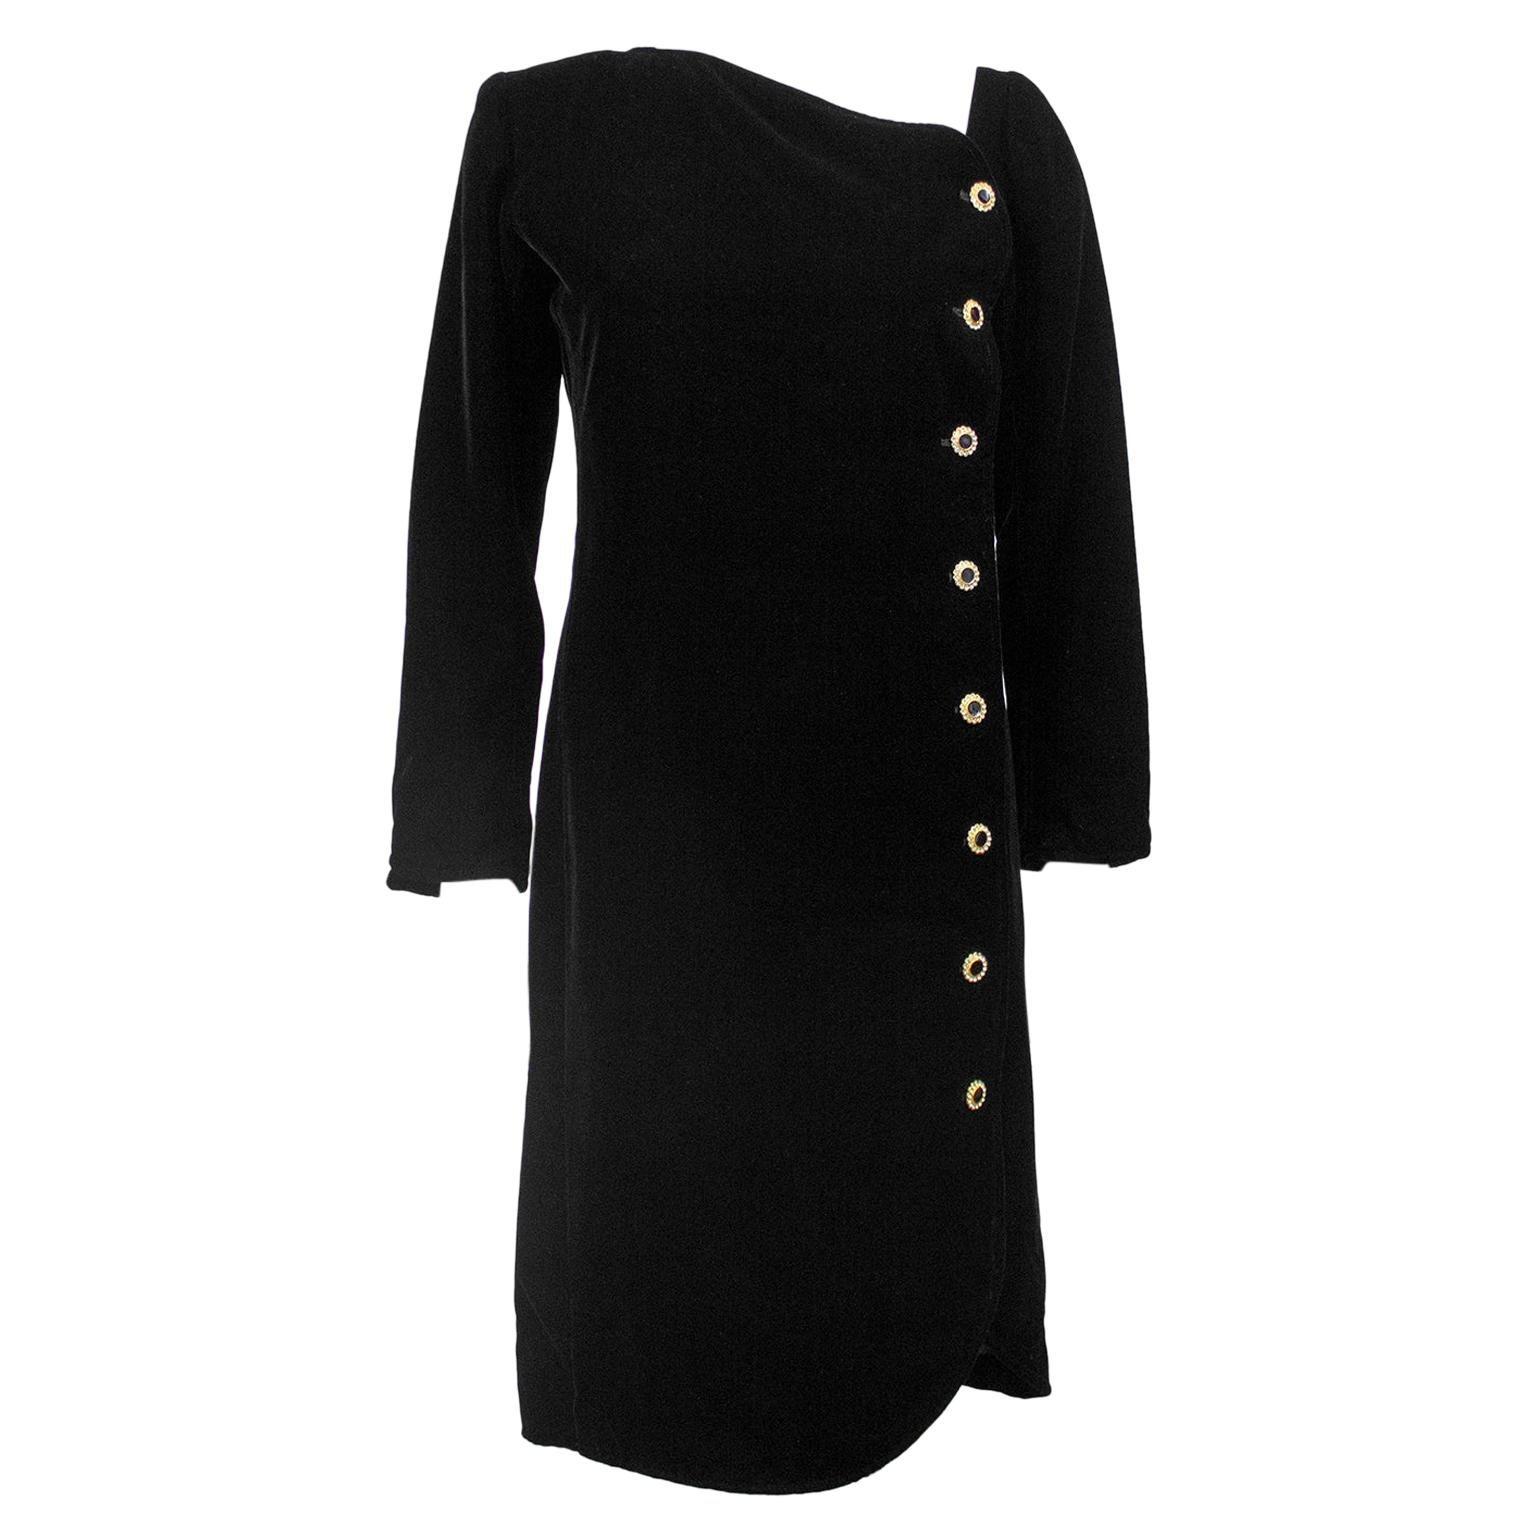 1980s Yves Saint Laurent/YSL Black Cocktail Dress